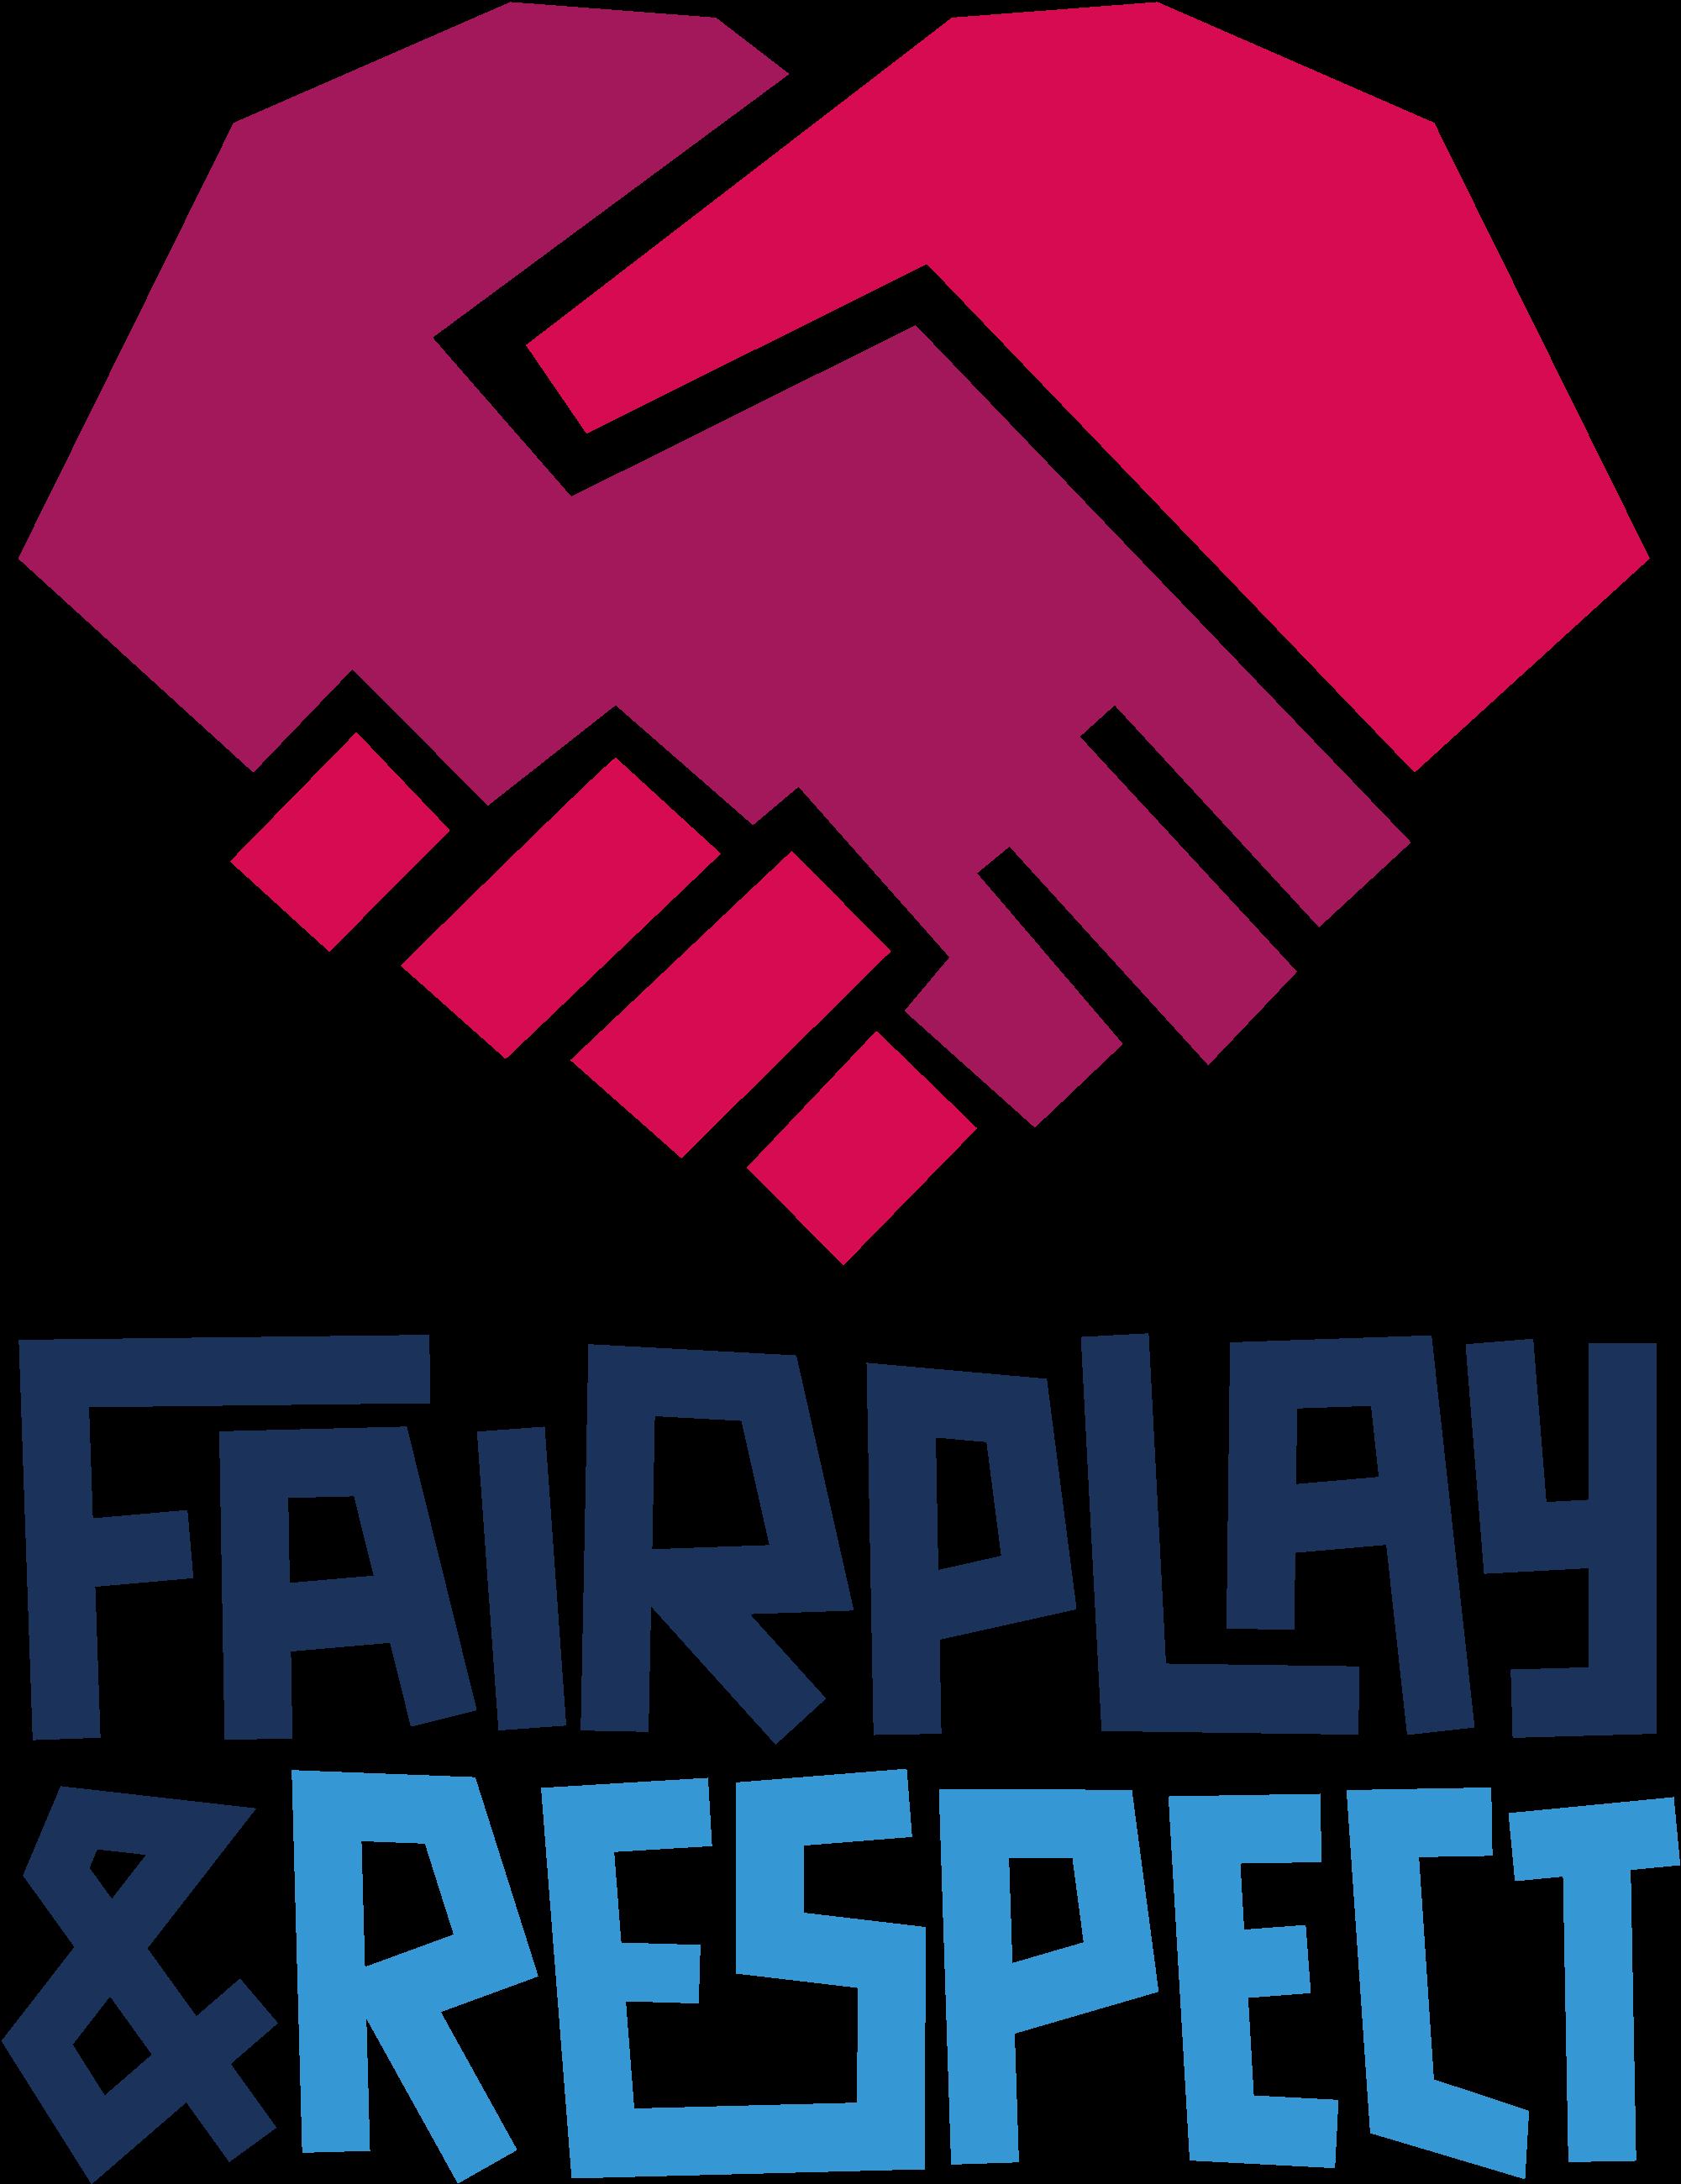 Ijnl fairplay logo staand kleur